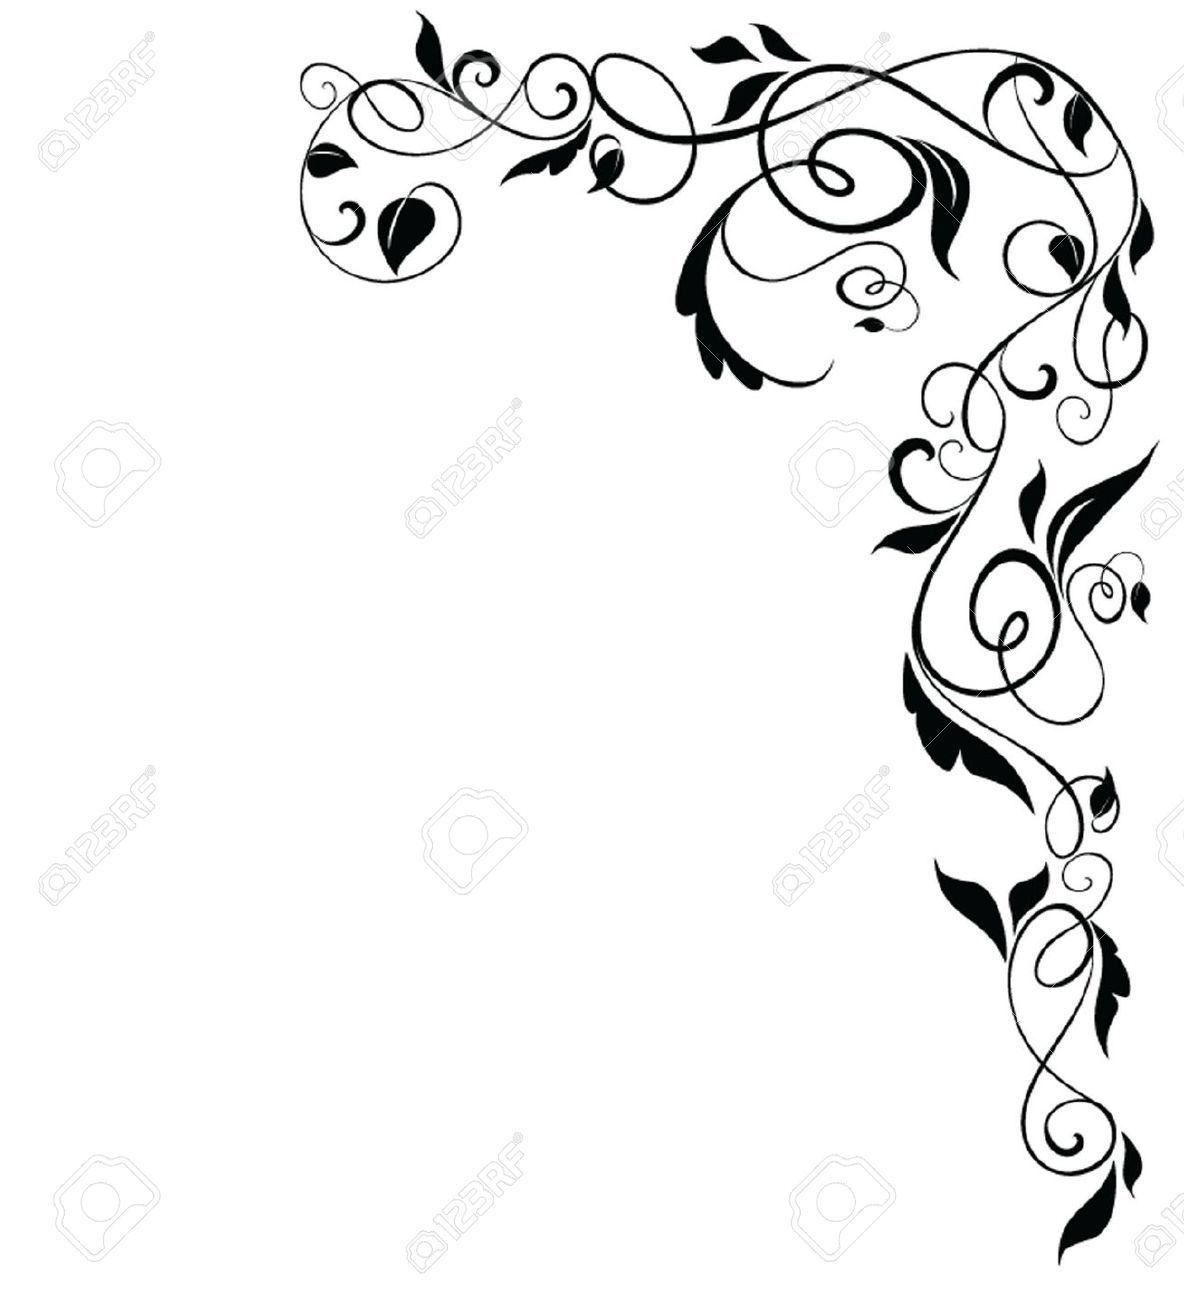 Award scroll corners clipart image royalty free download decorative corner scrolls - Google Search | Iron & Scroll Work ... image royalty free download